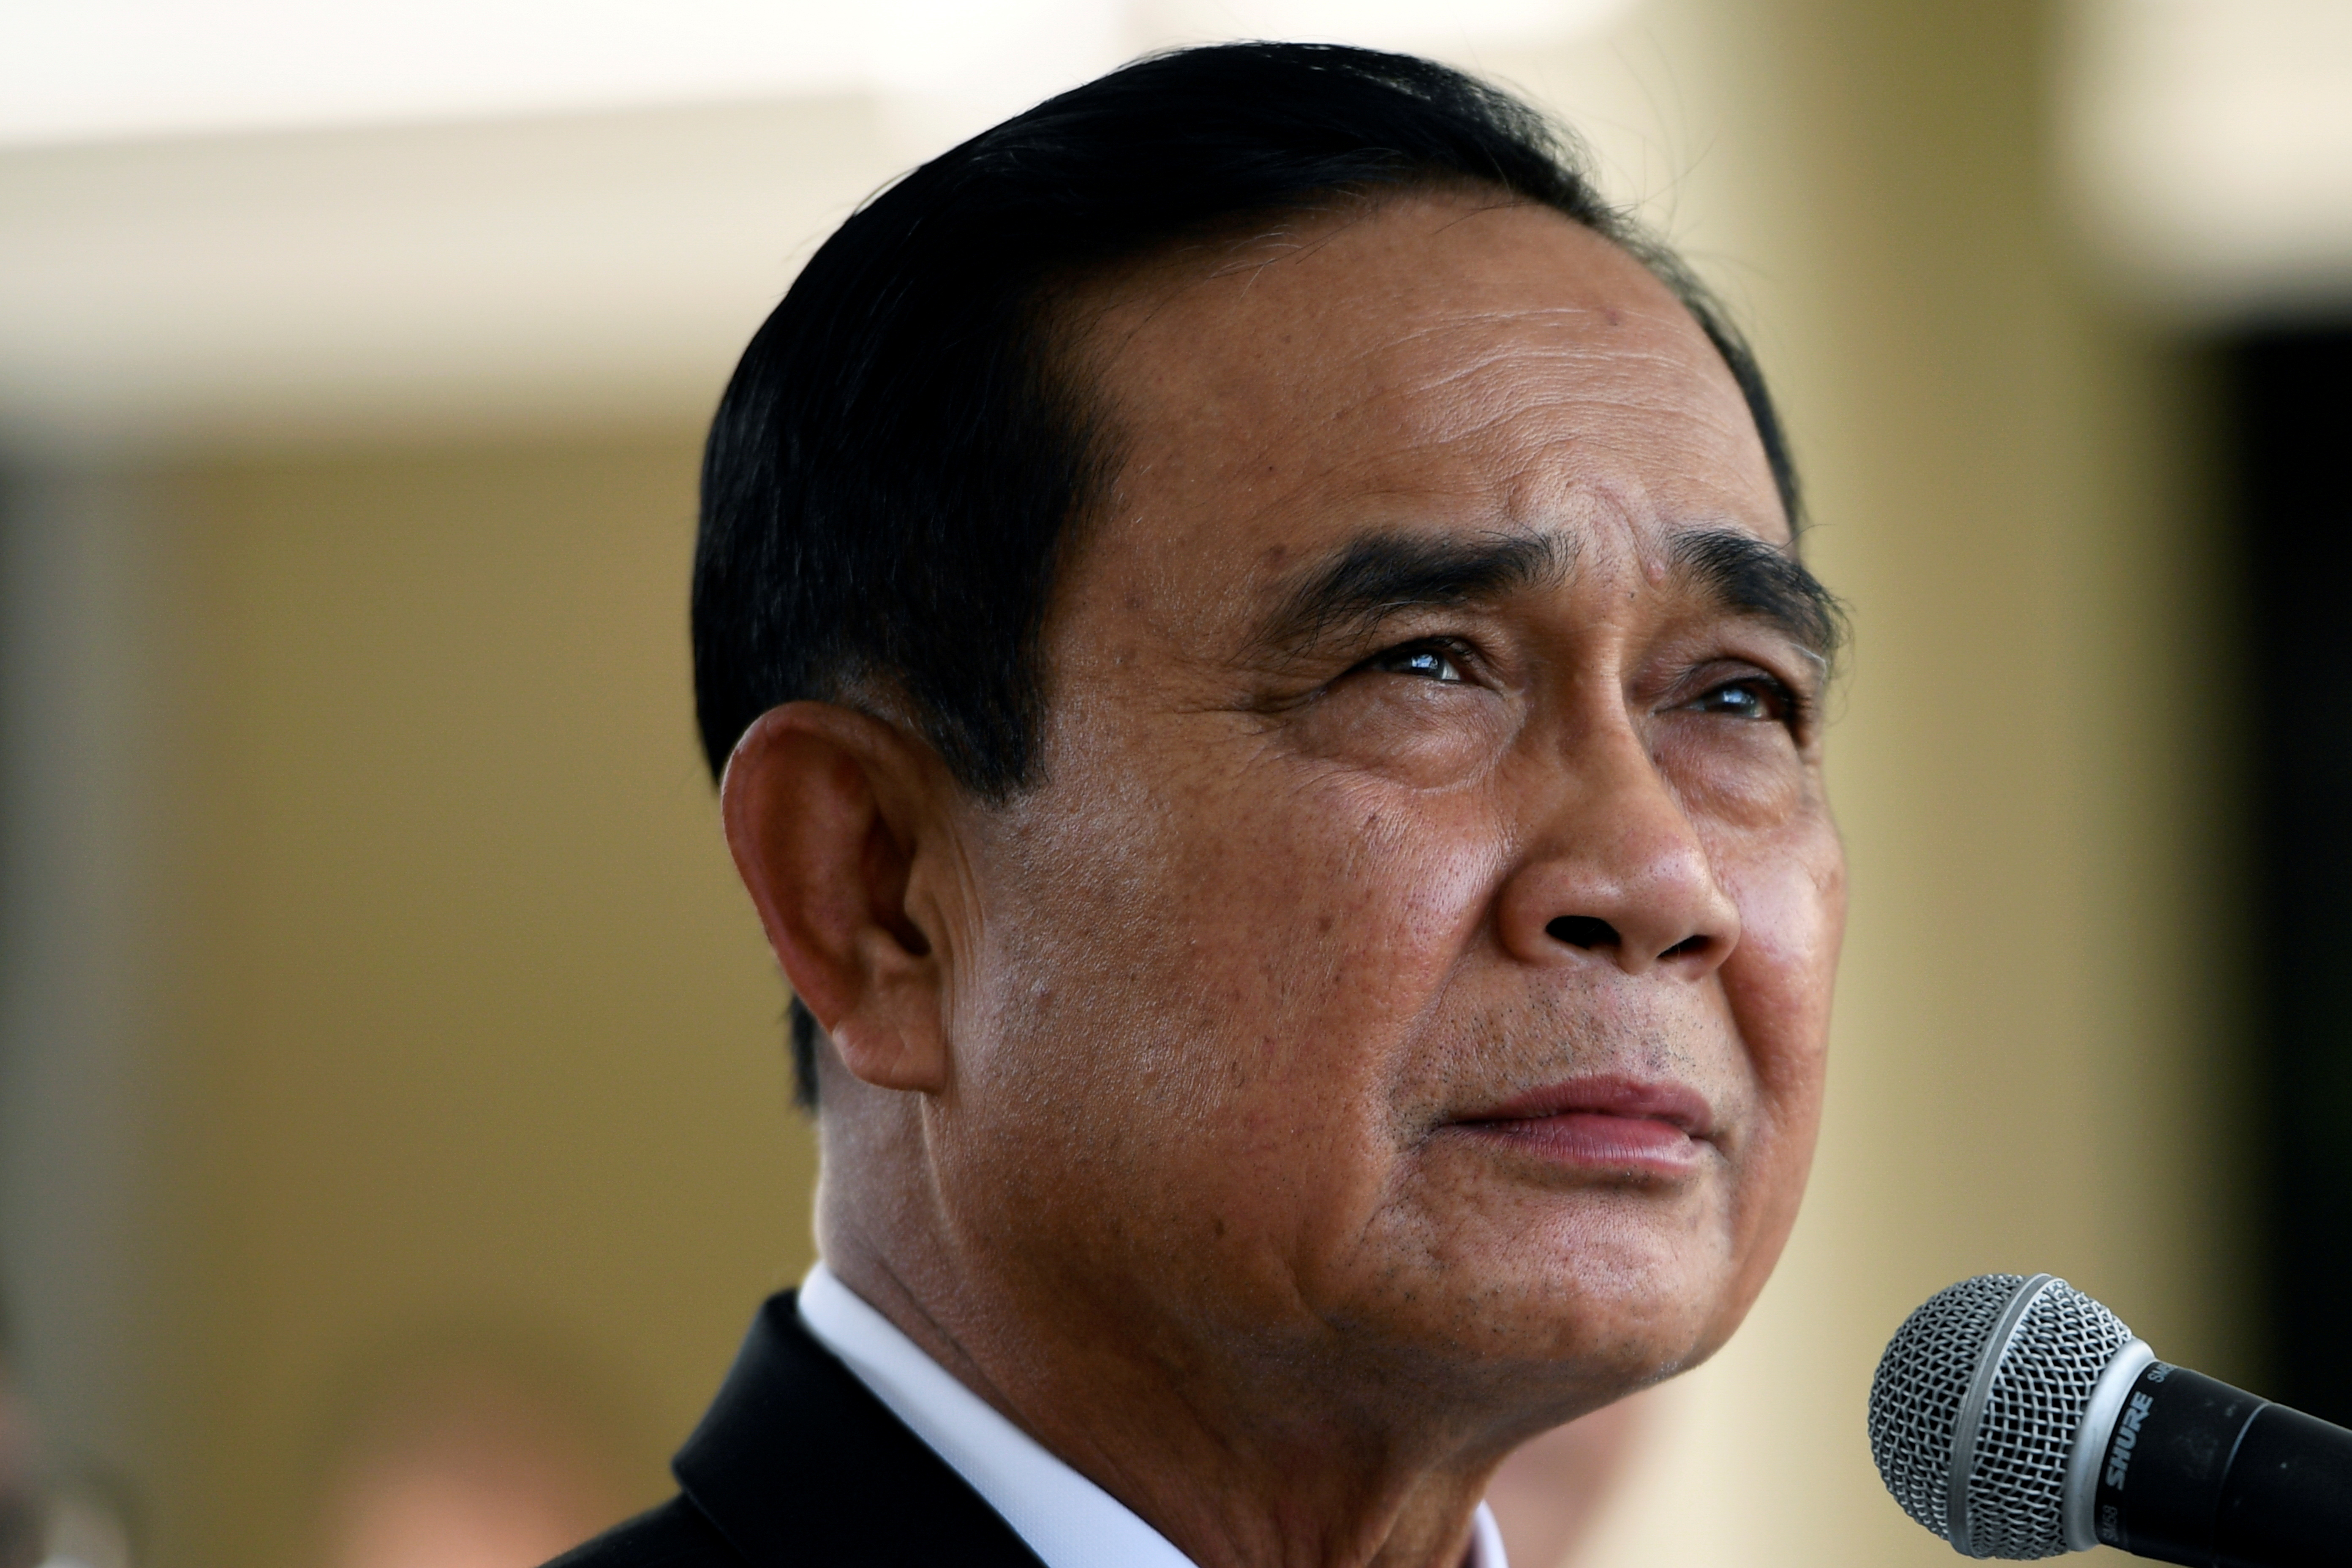 Thai Prime Minister Prayuth Chan-ocha at Government House, in Bangkok, Thailand November 27, 2020. REUTERS/Chalinee Thirasupa/Pool